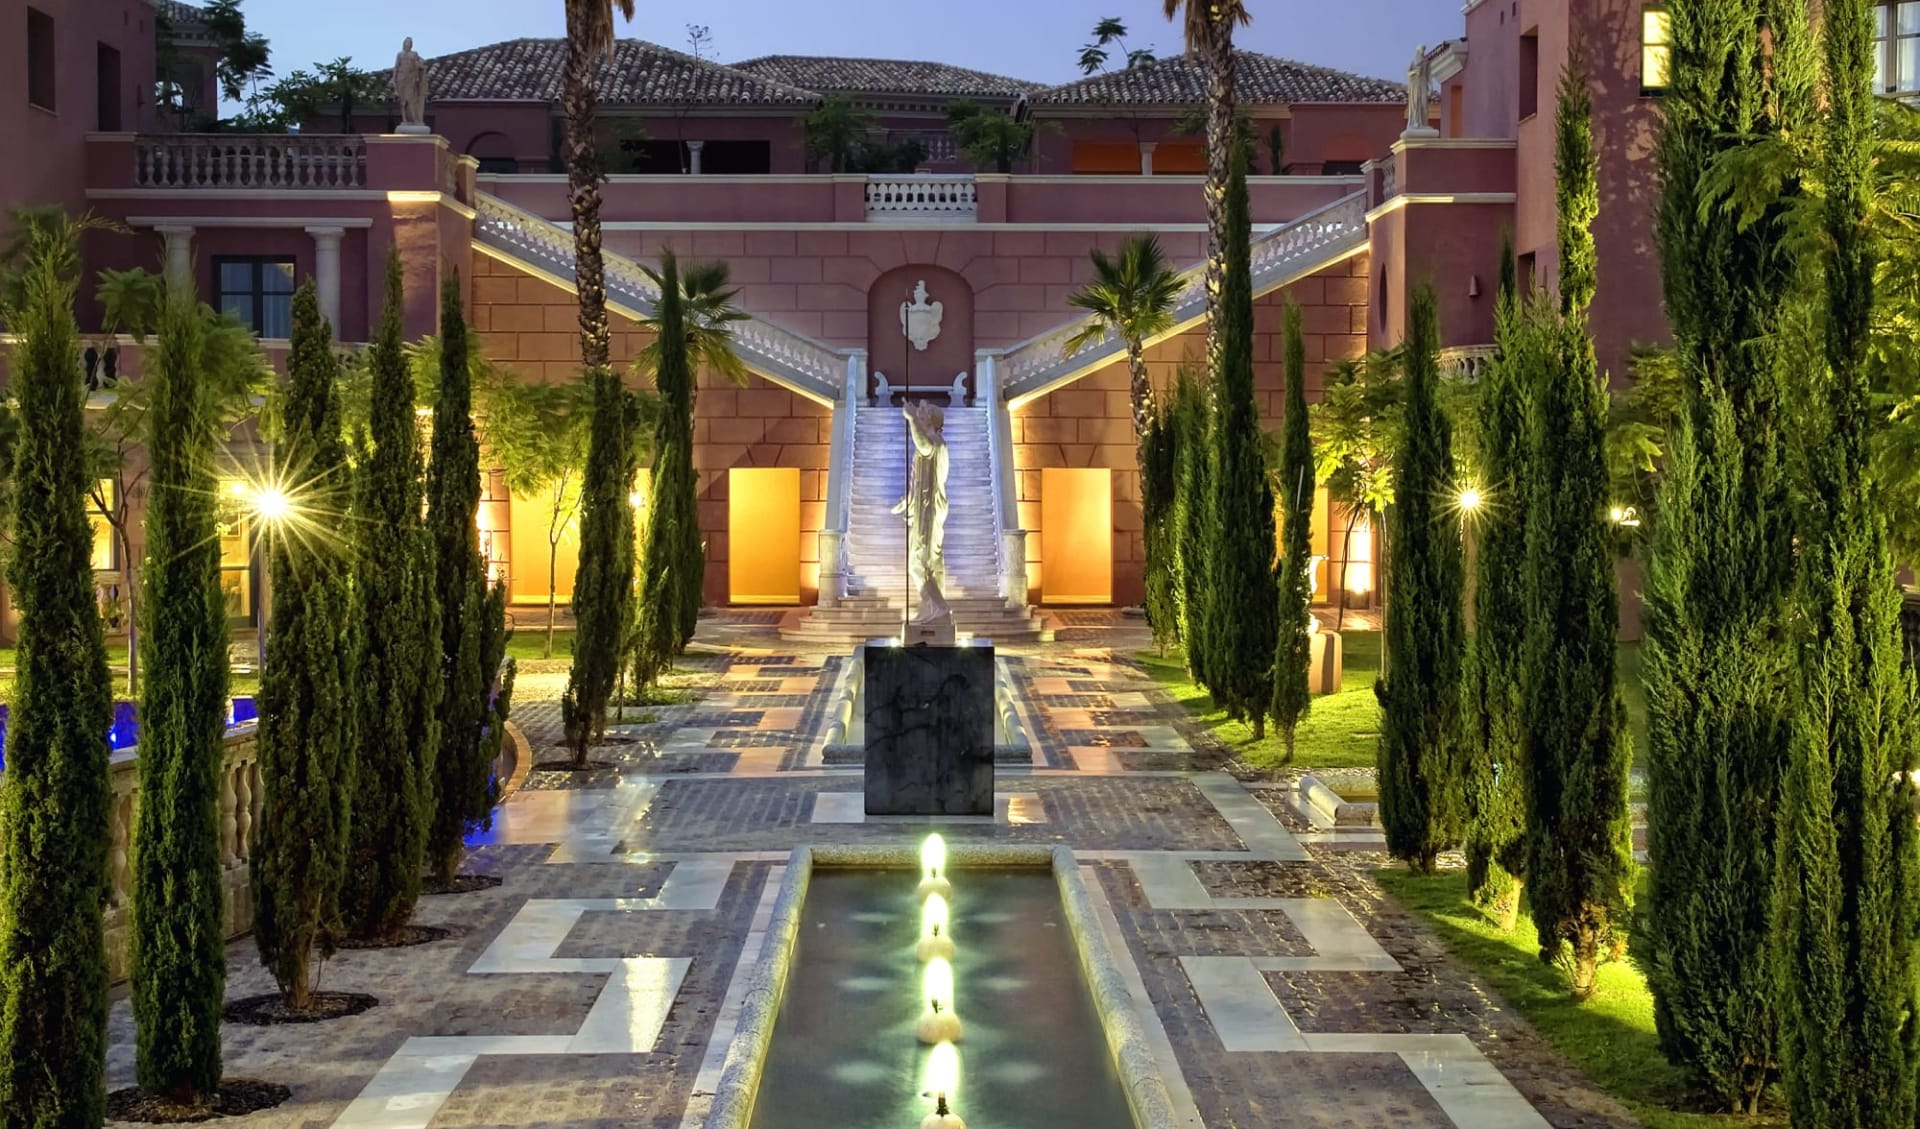 Anantara Villa Padierna Palace in Marbella:  Golf Hotel Villa Padierna Palace - Brunnen beim Amphitheater